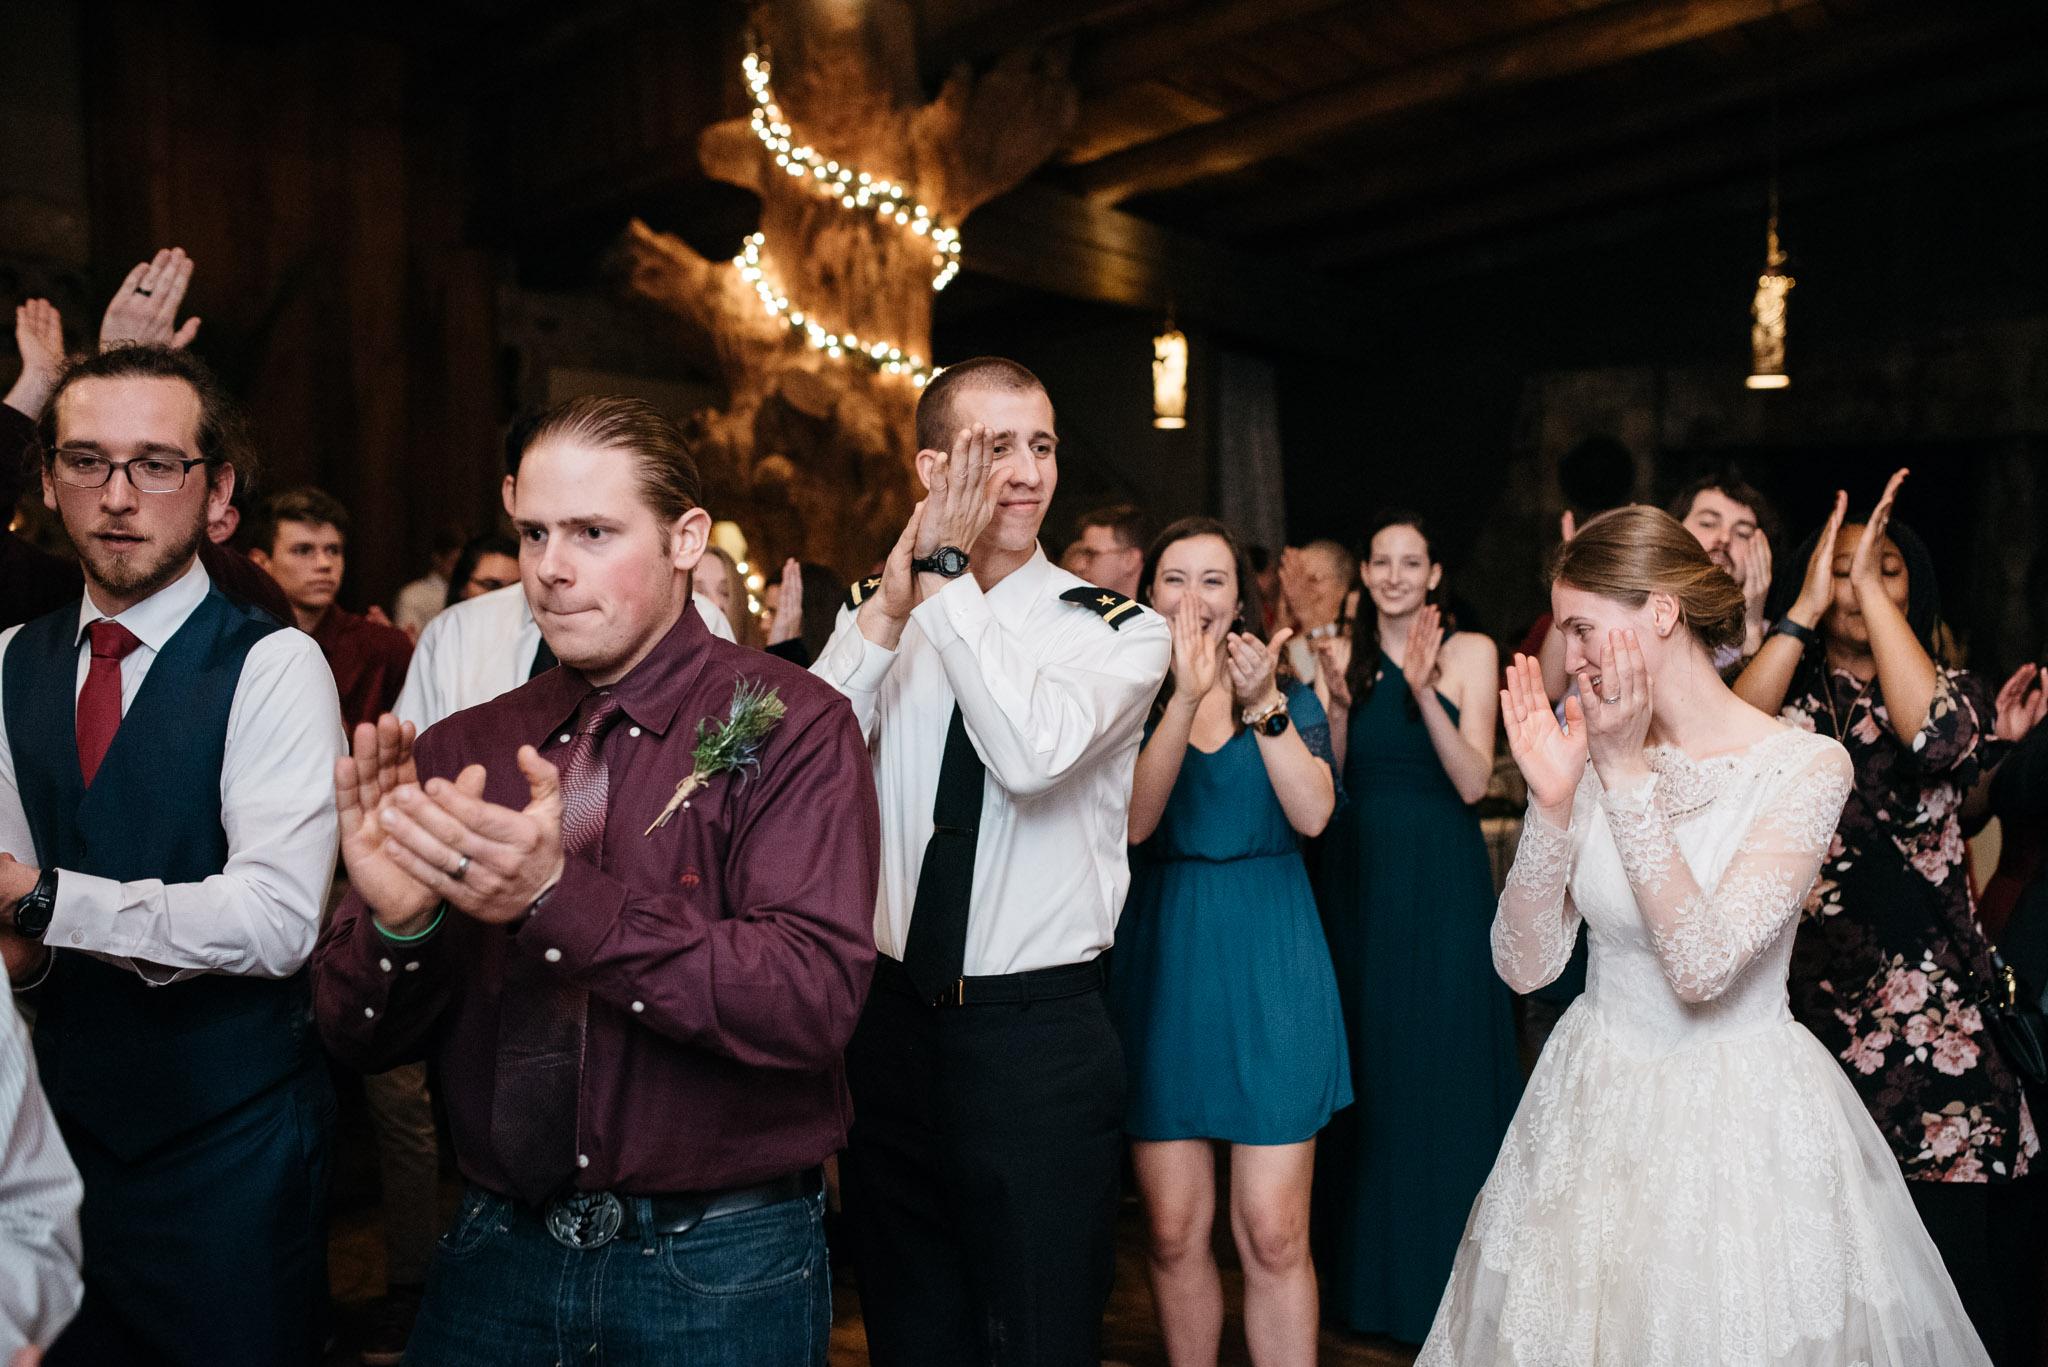 Green Gables Wedding reception, wedding photography, mariah fisher photography-7485.jpg